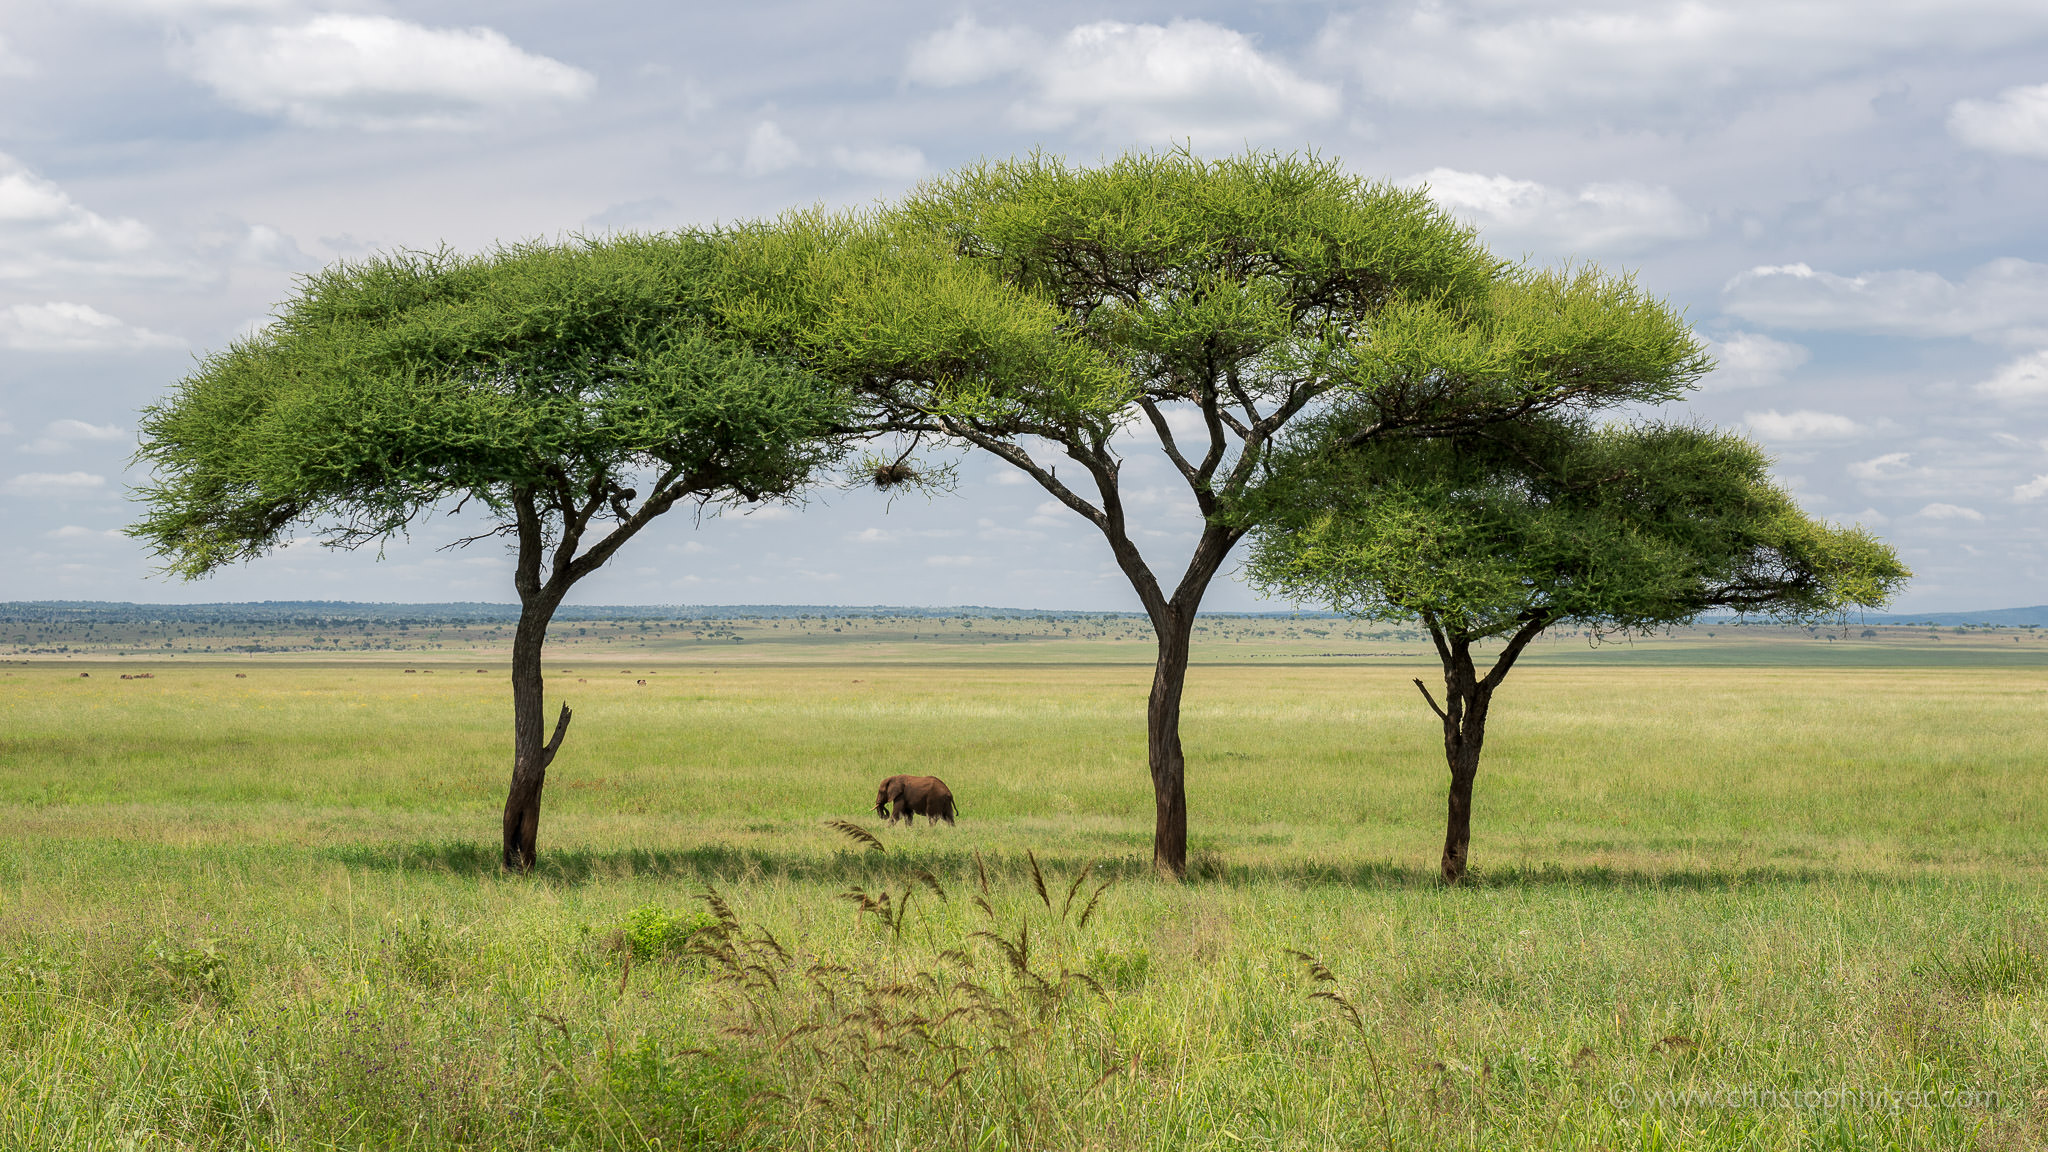 Elefant unter Schirmakazien im Tarangire-Nationalpark, Tansania